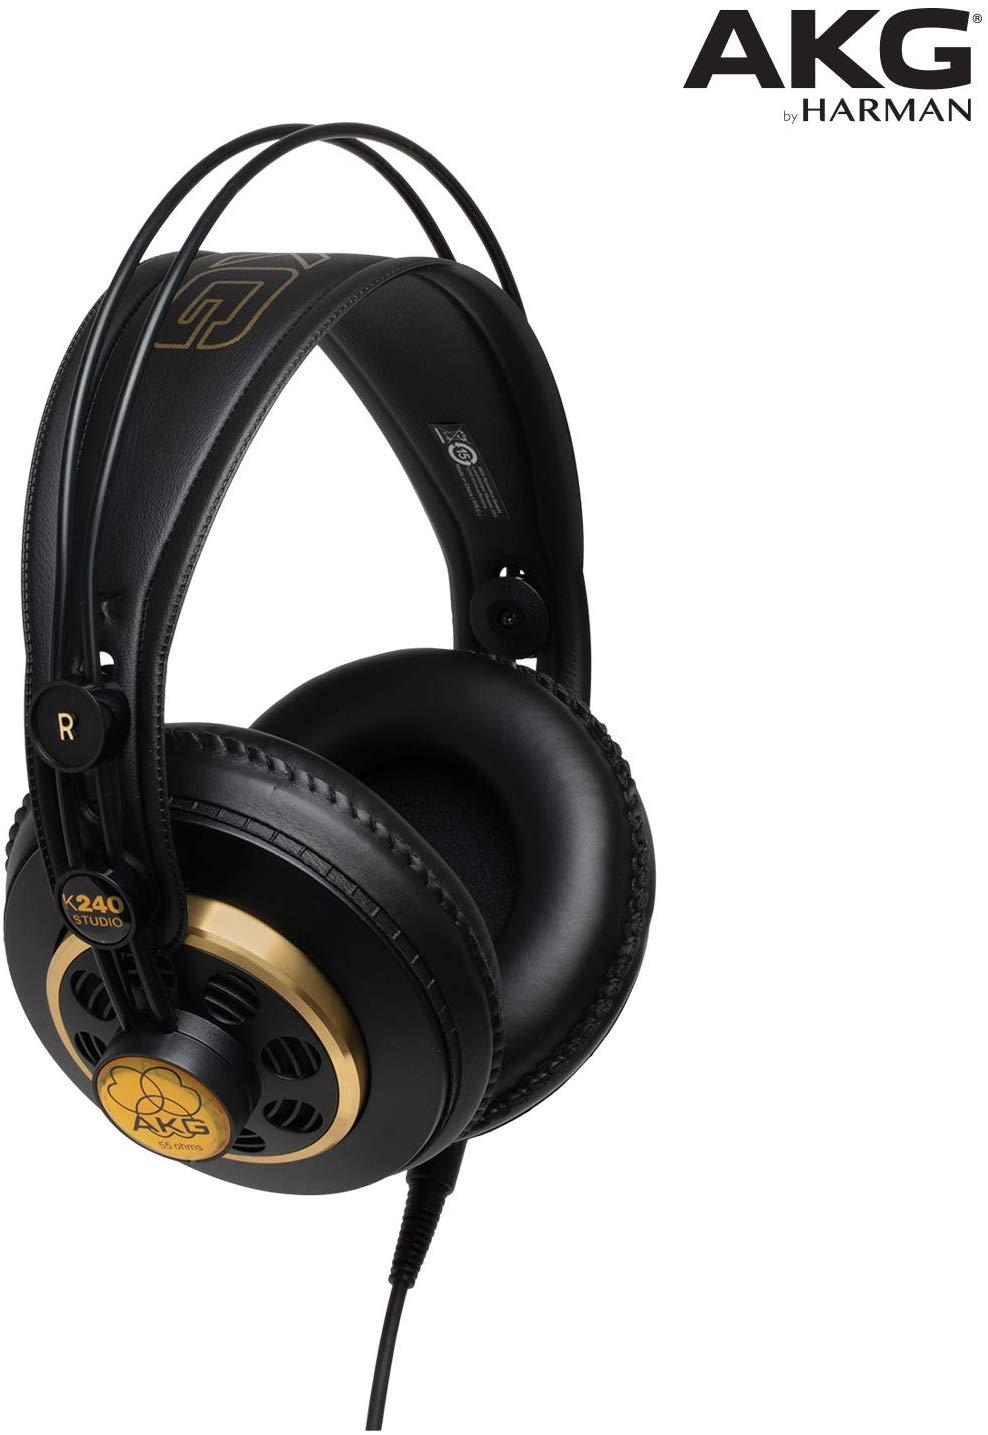 AKG K240 STUDIO Professional Semi-Open, Over-Ear Headphones £35.99 & FREE Delivery @ Amazon UK